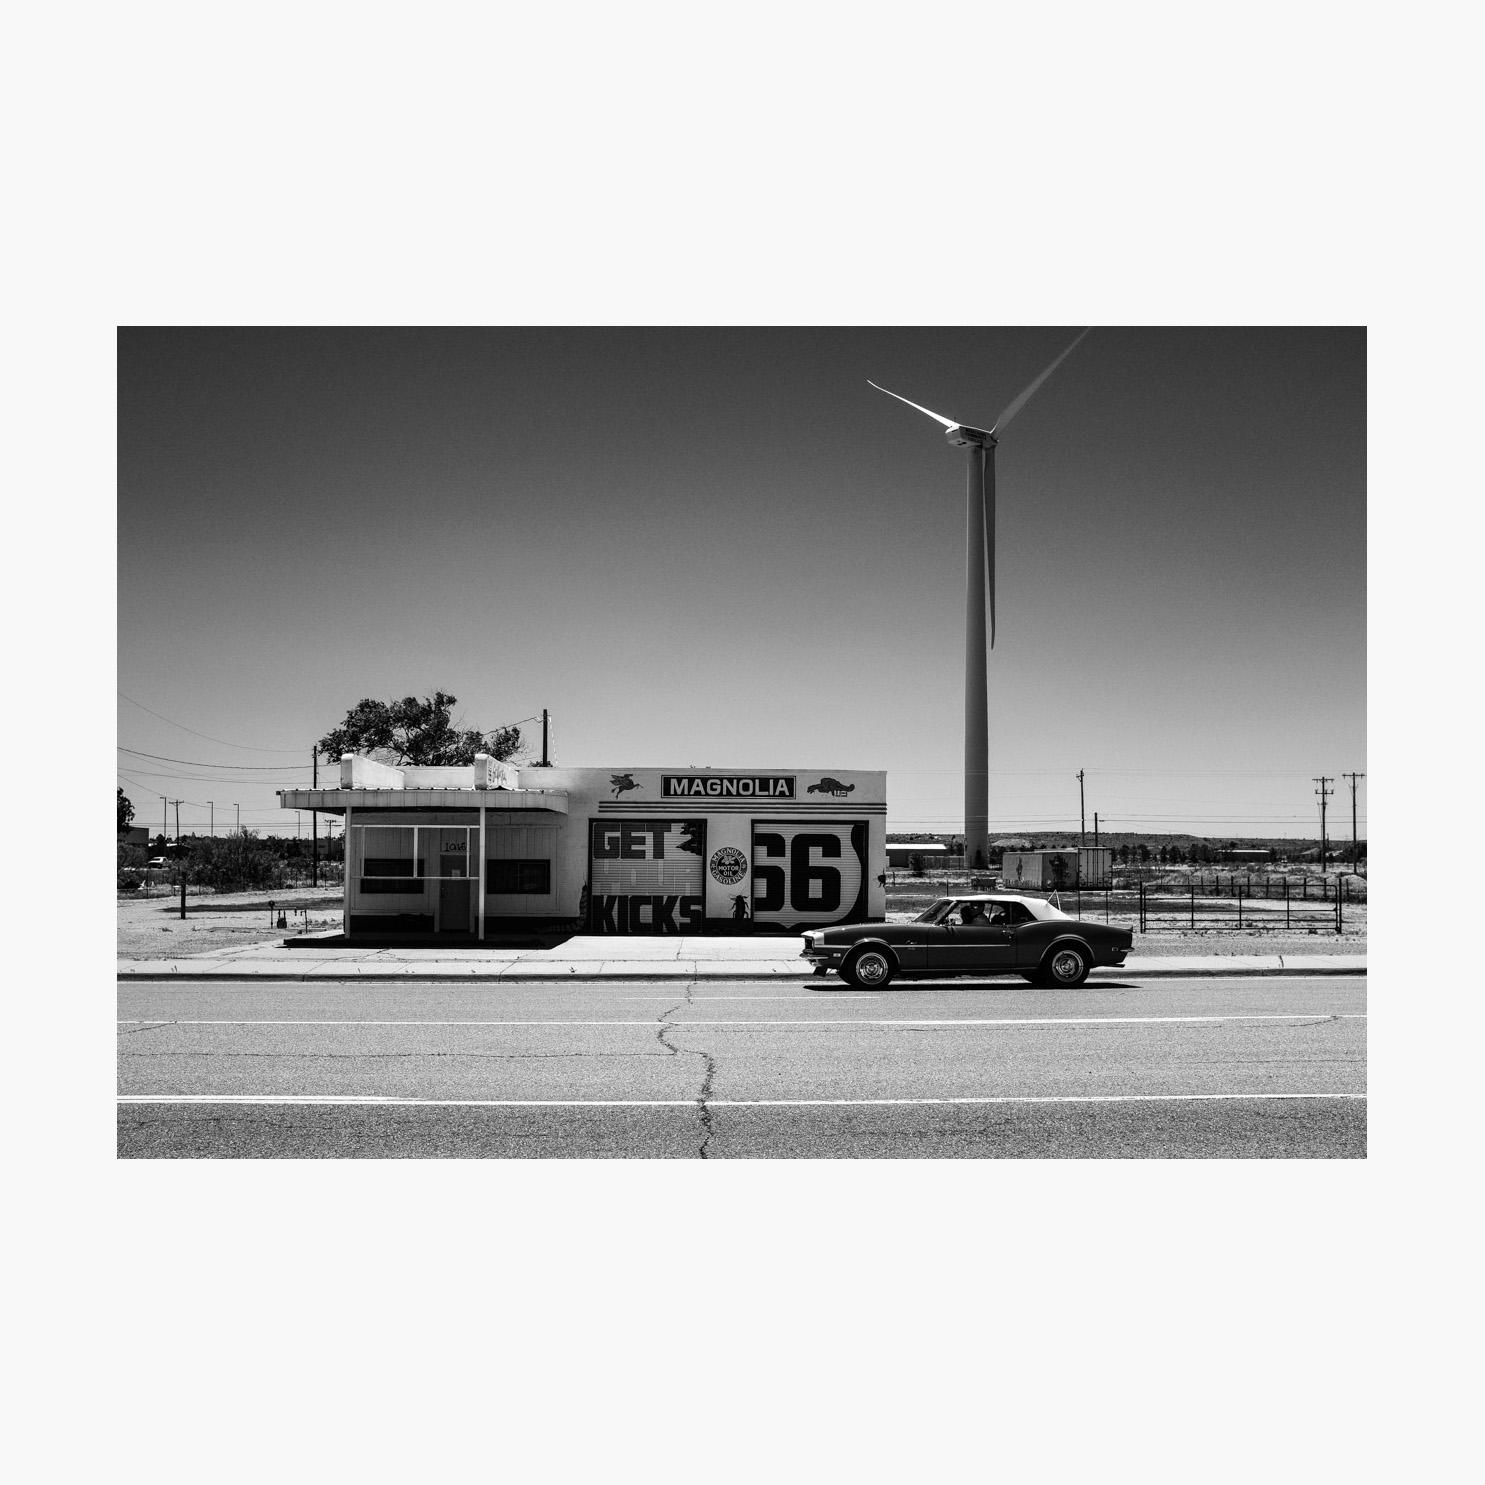 ©-Harry-W-Edmonds-2018-@photographersnote-the-long-road-PN04.jpg